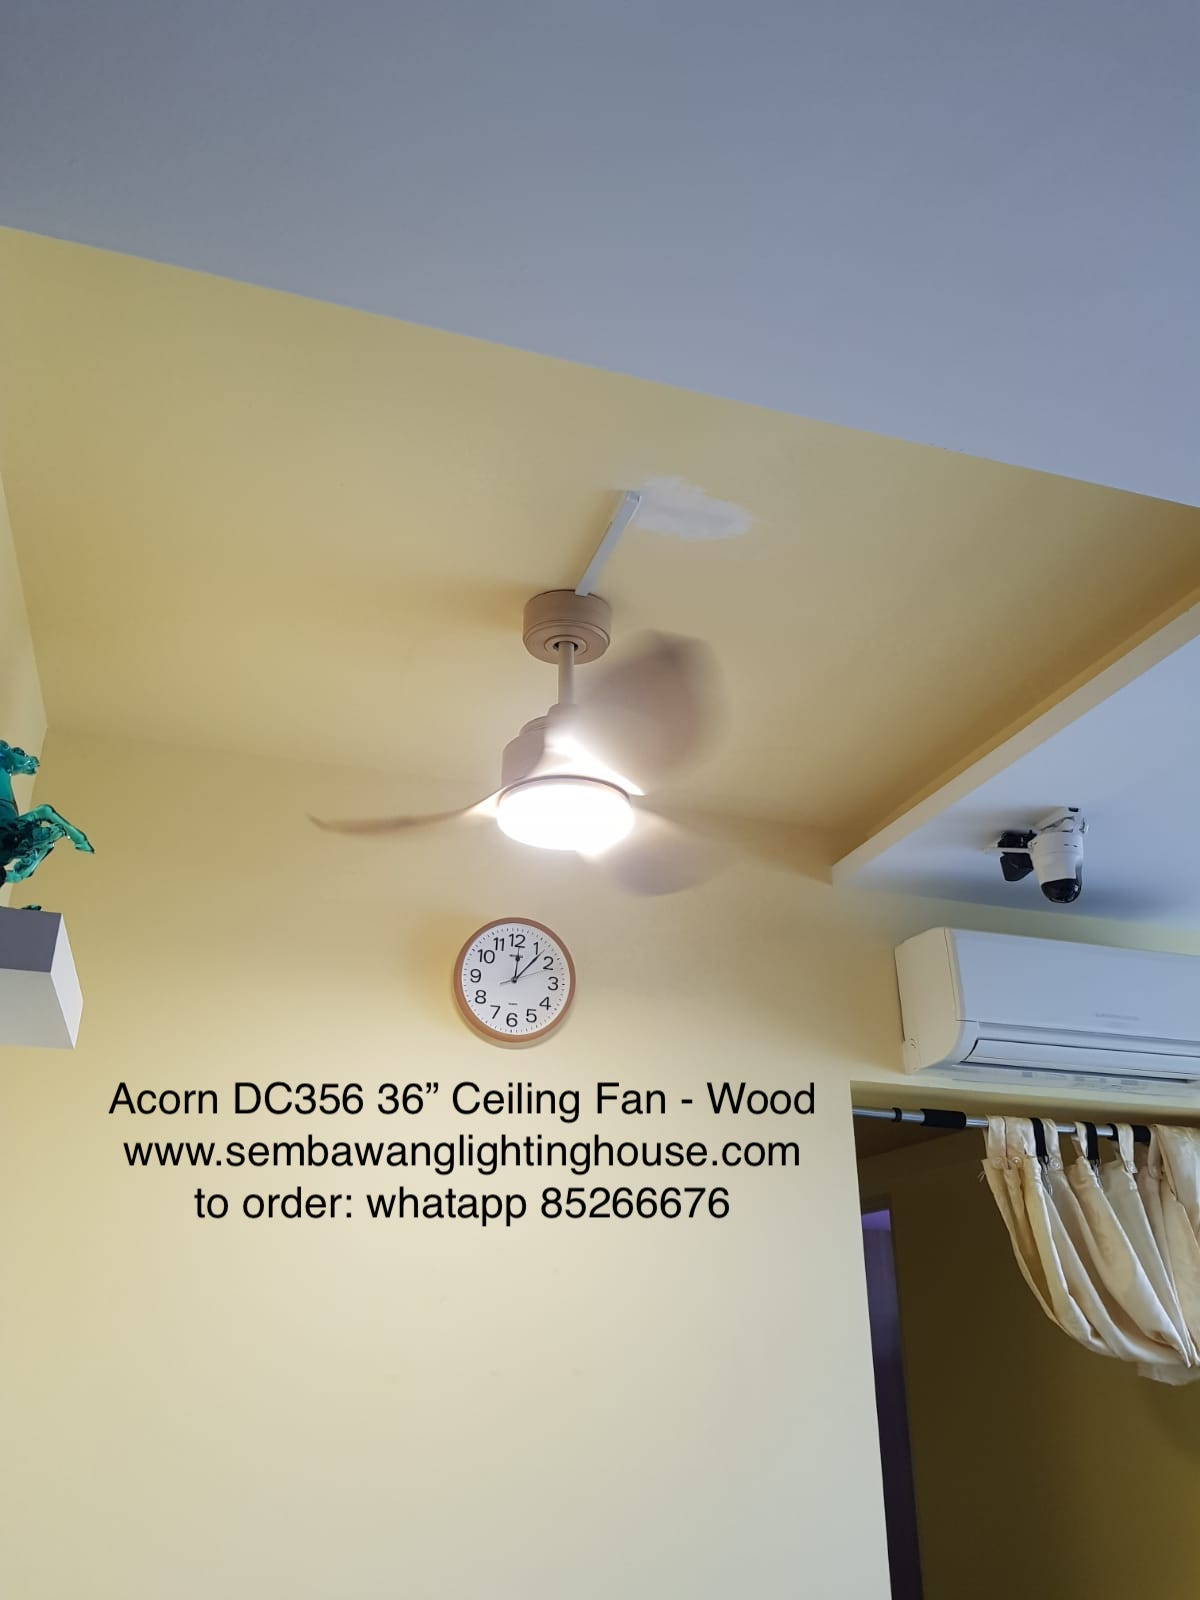 sample-01-acorn-dc356-ceiling-fan-wood-sembawang-lighting-house.jpg